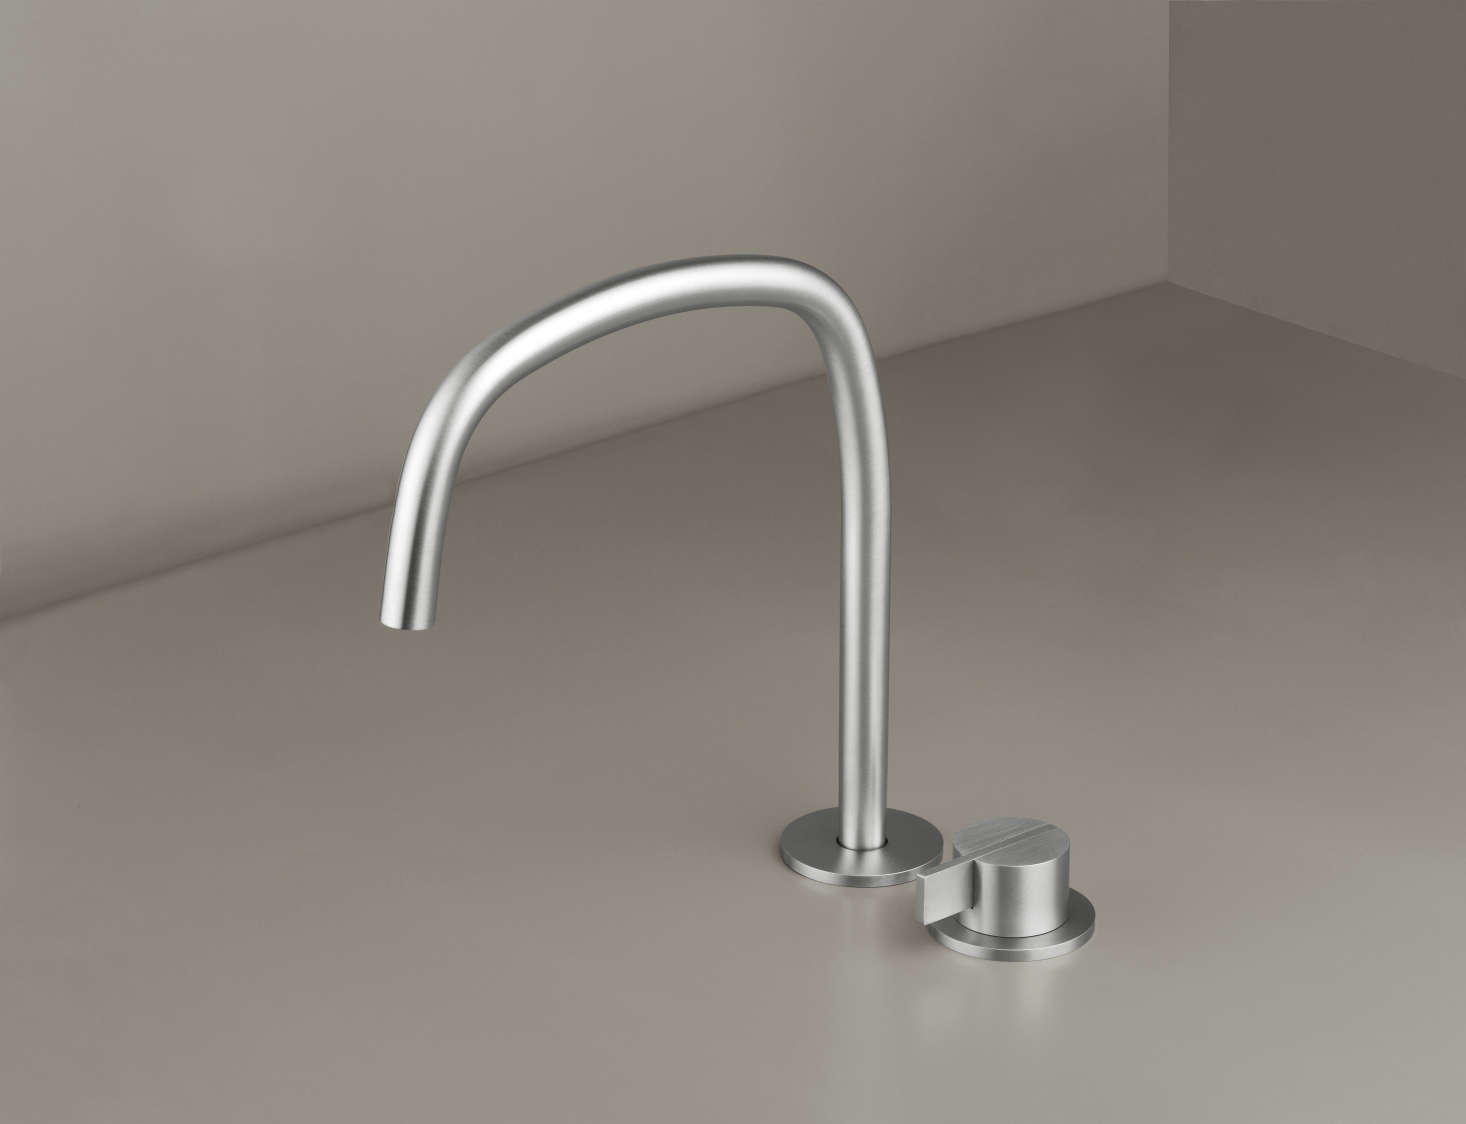 Bath Faucets & Fixtures from a Prolific Dutch Designer